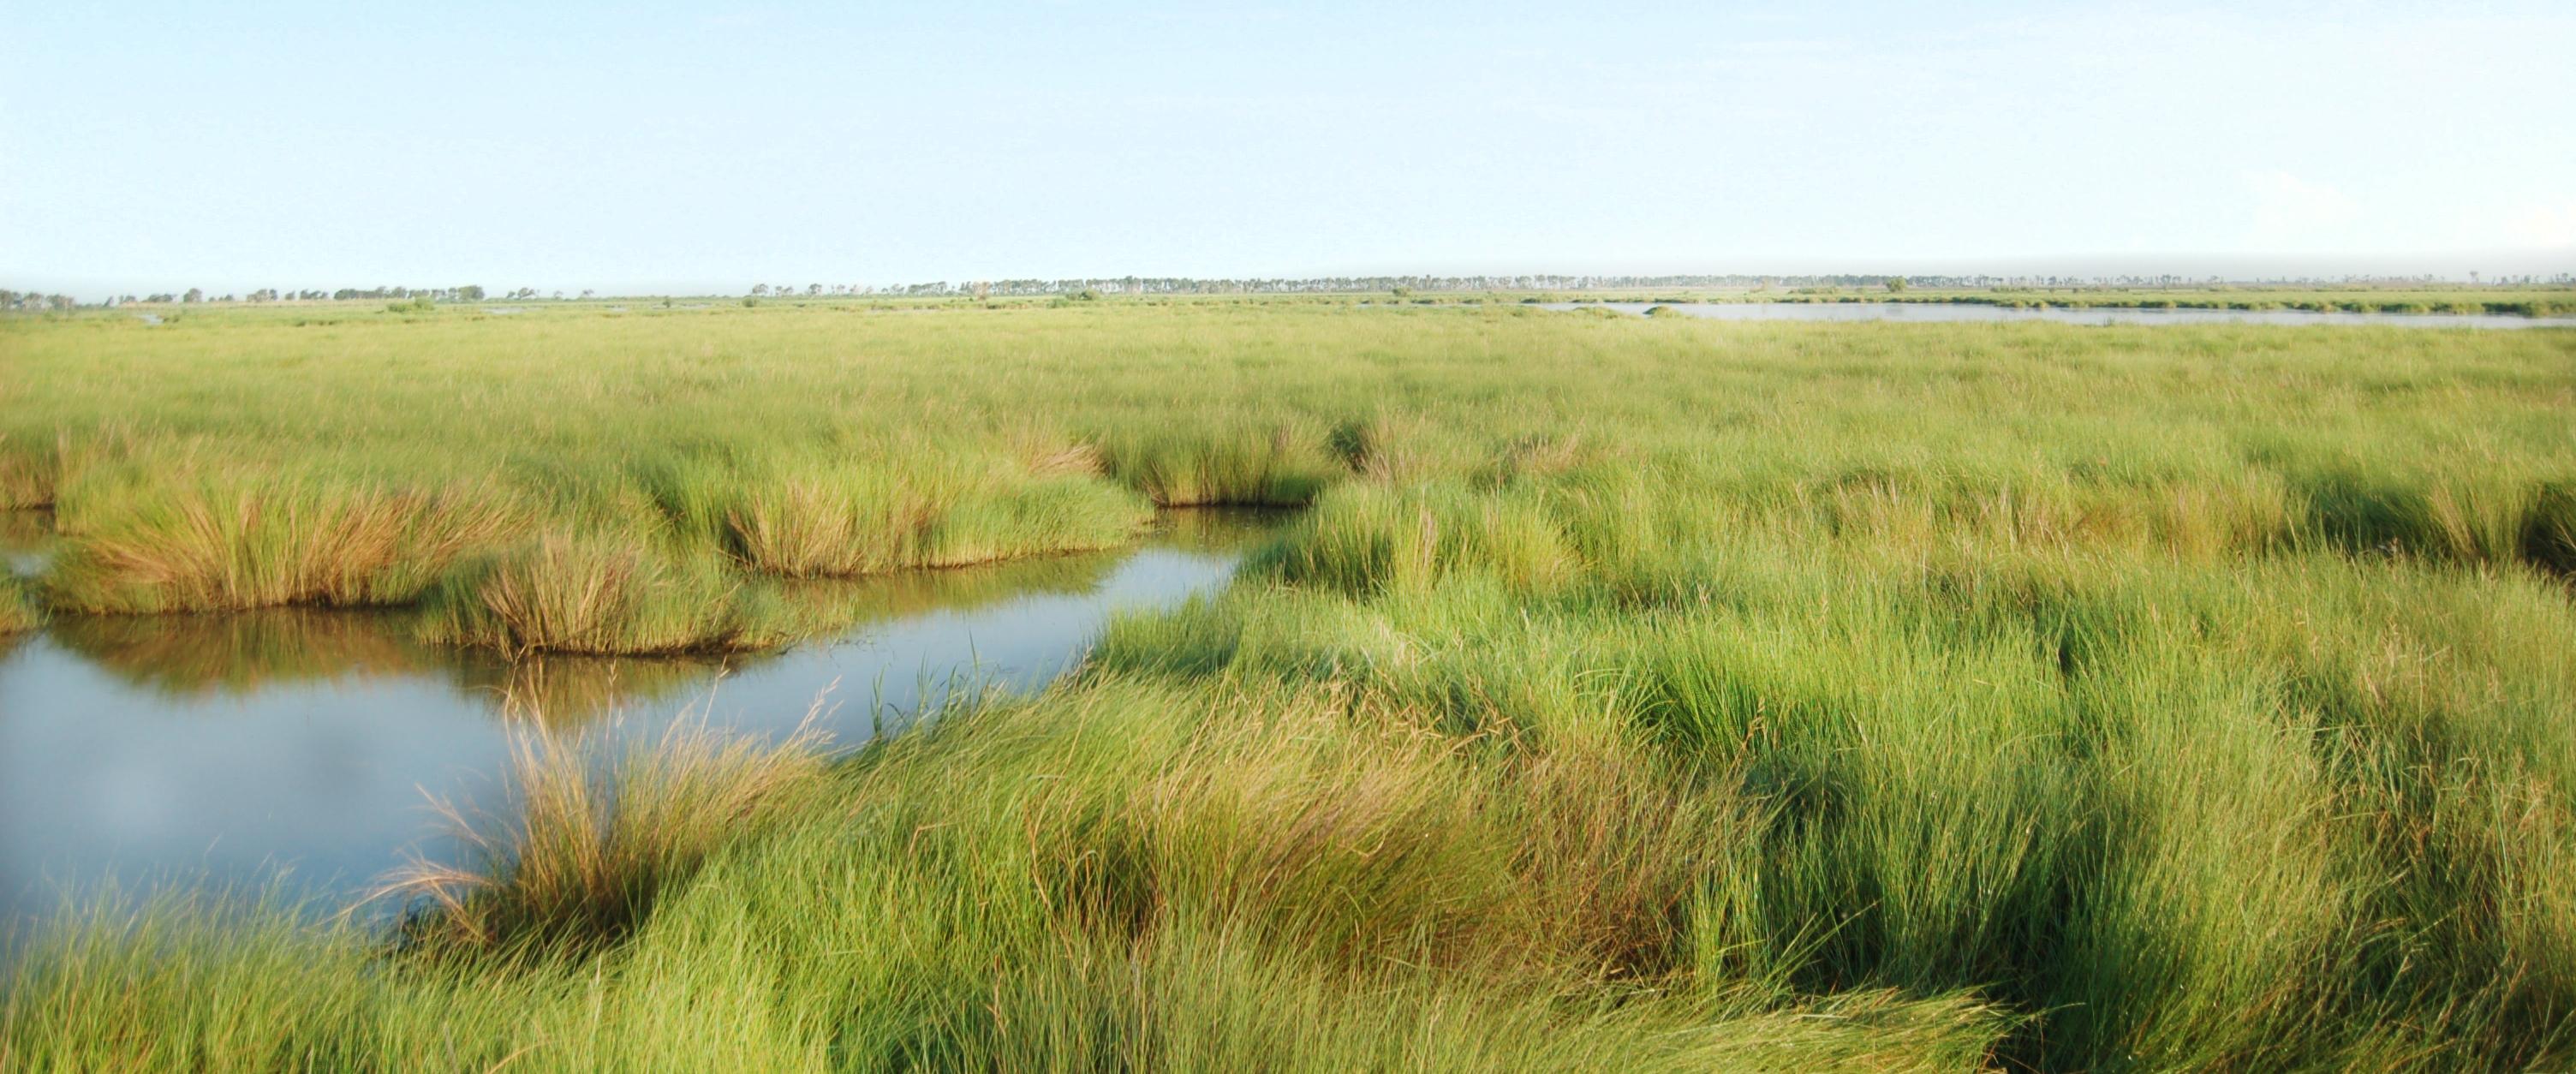 Louisiana Trustees Initiate Restoration Plan #6 for Wetlands, Coastal and Nearshore Habitats